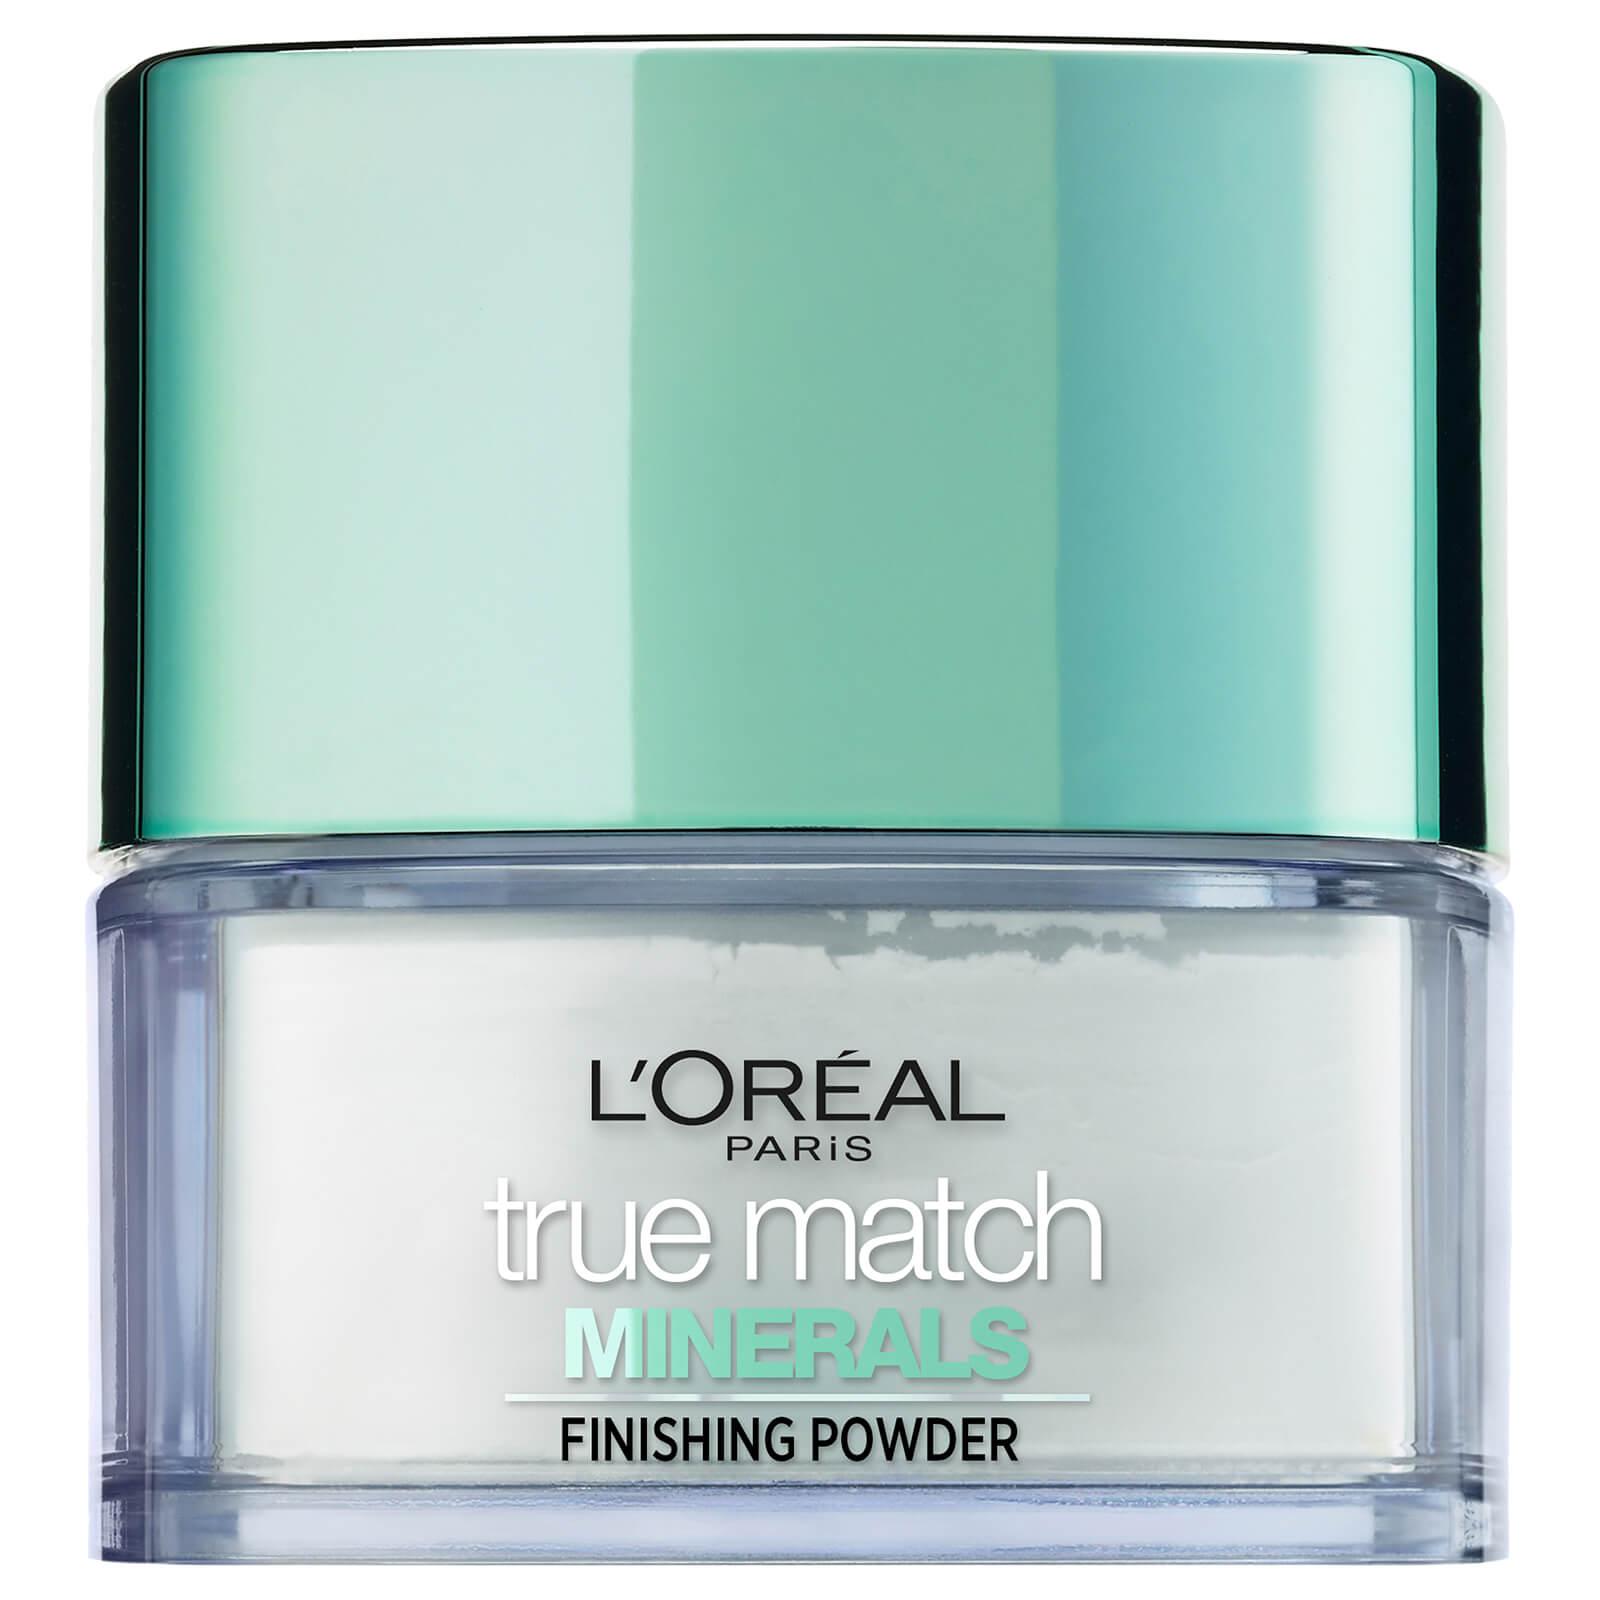 Купить L'Oréal Paris True Match Minerals Finishing Face Powder 9g